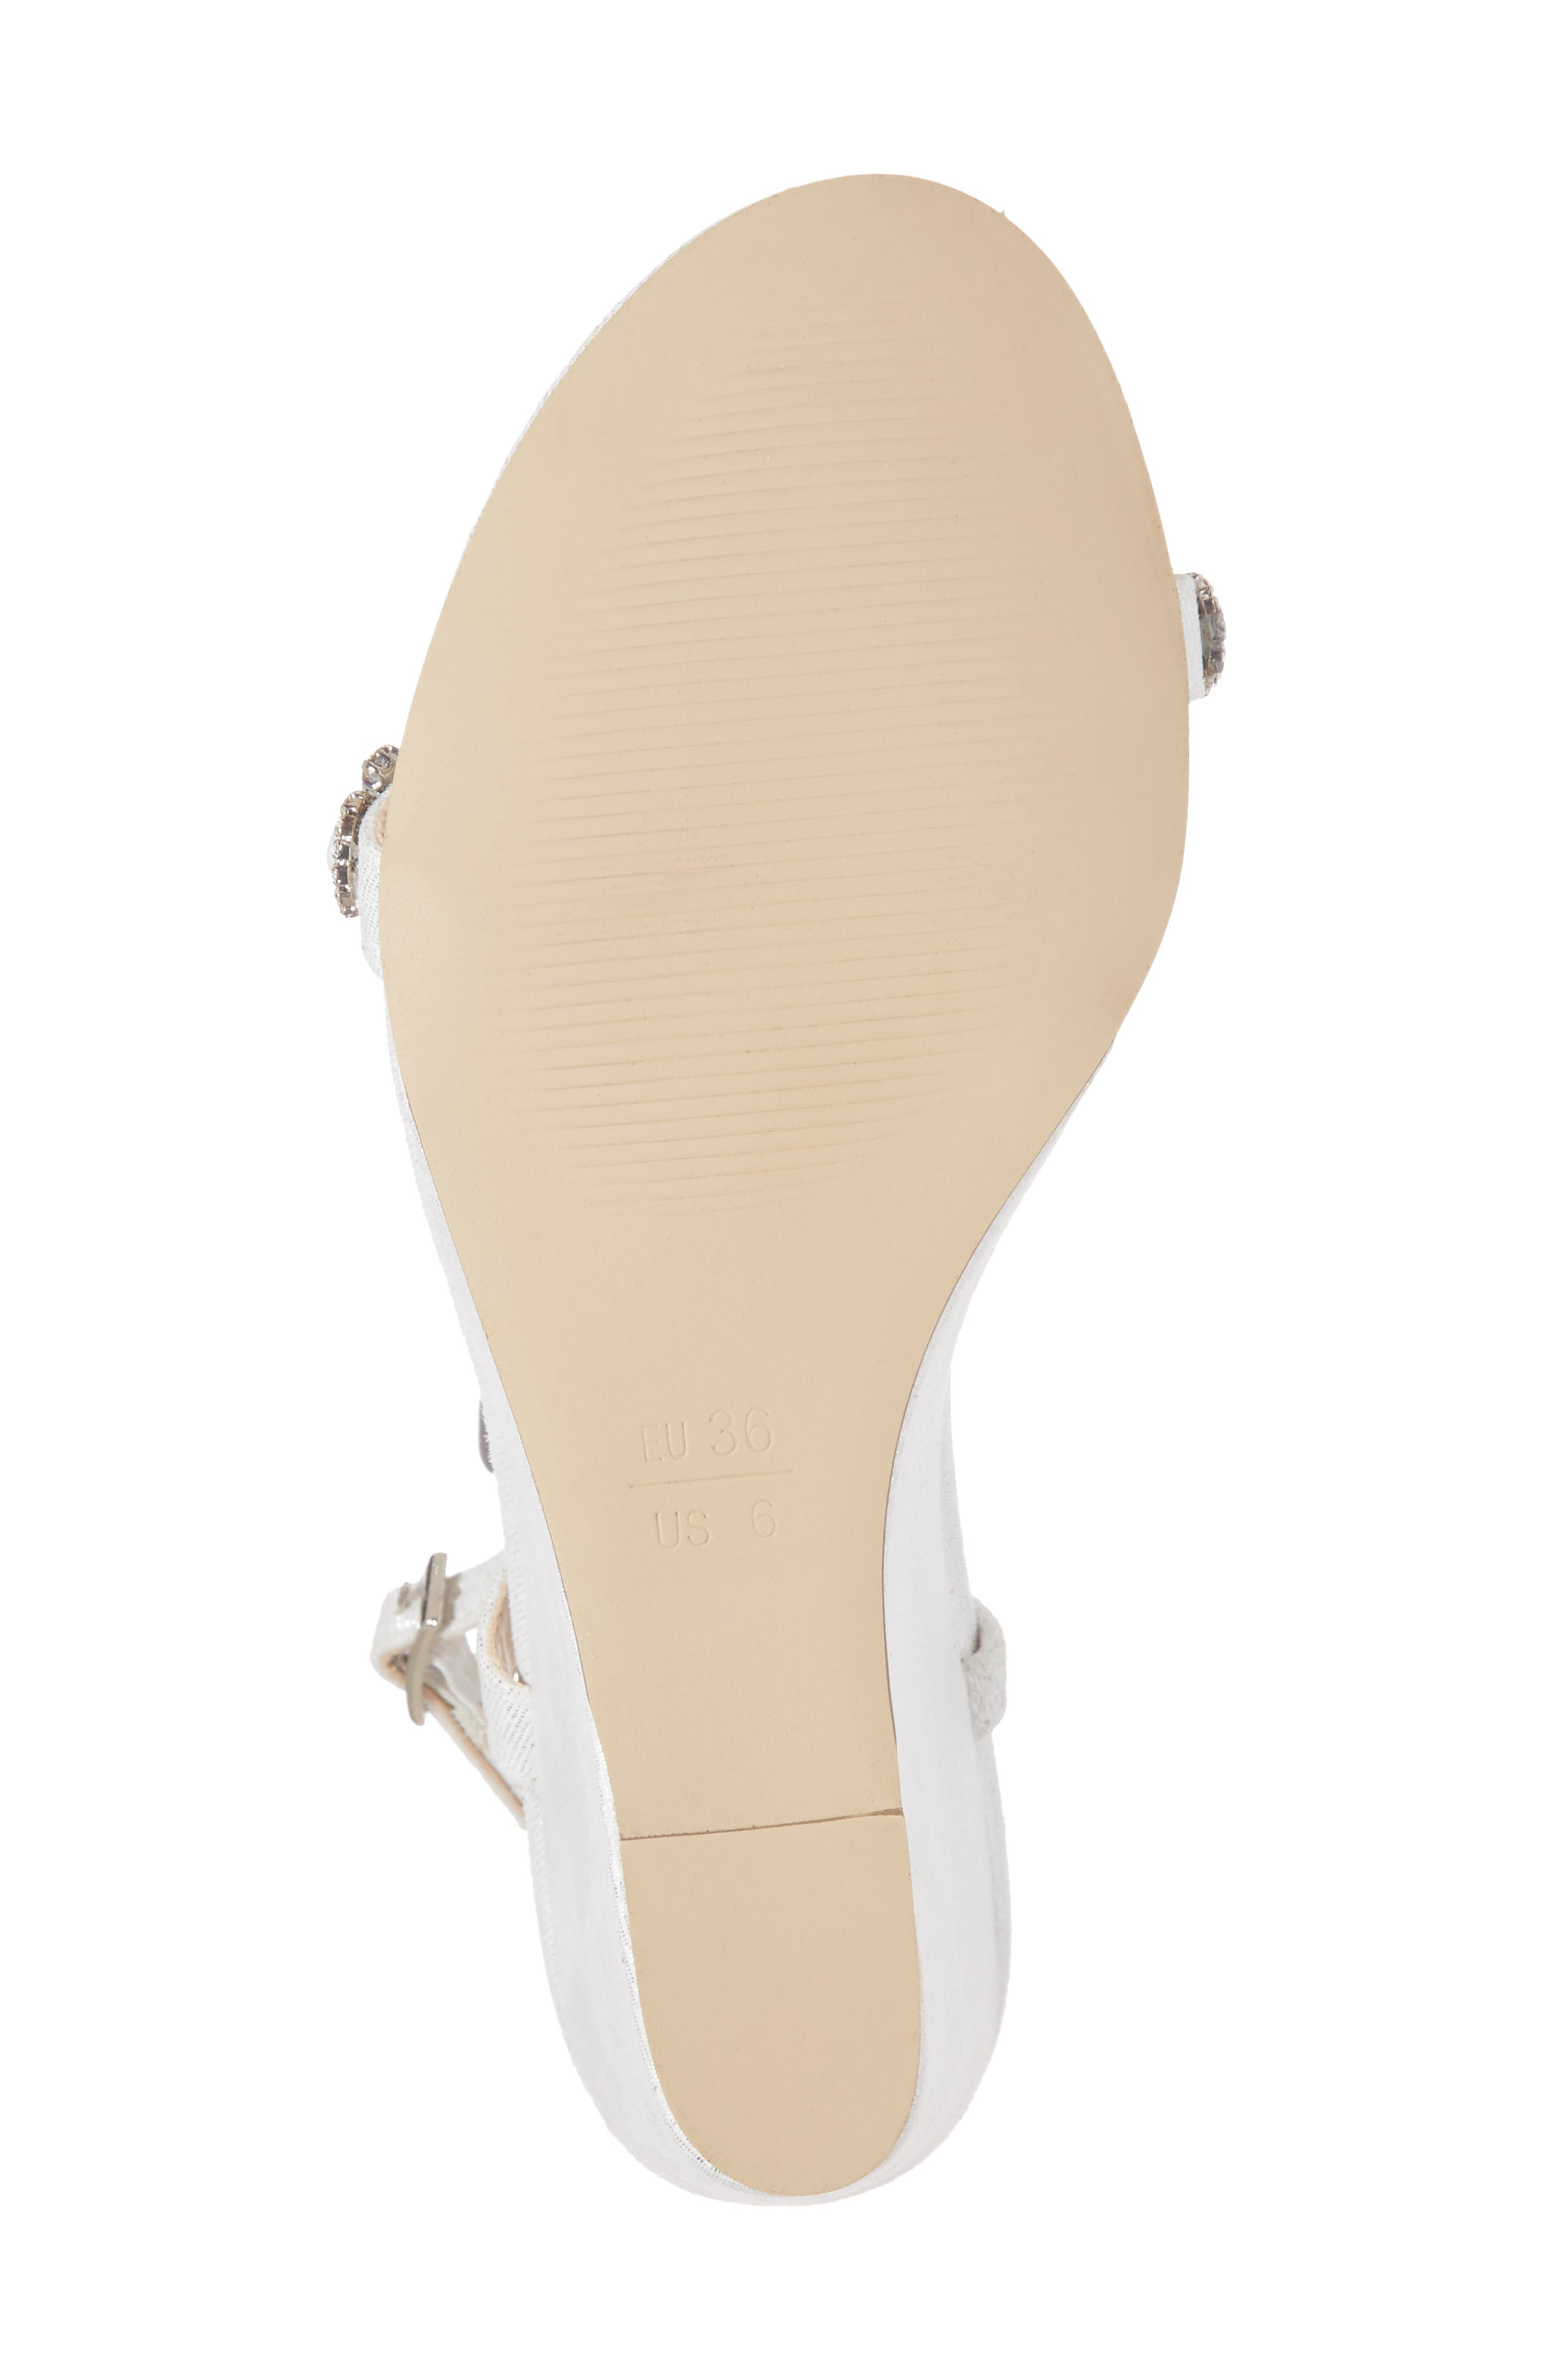 Kiana Embellished Wedge Sandal,                             Alternate thumbnail 6, color,                             SILVER GLITTER